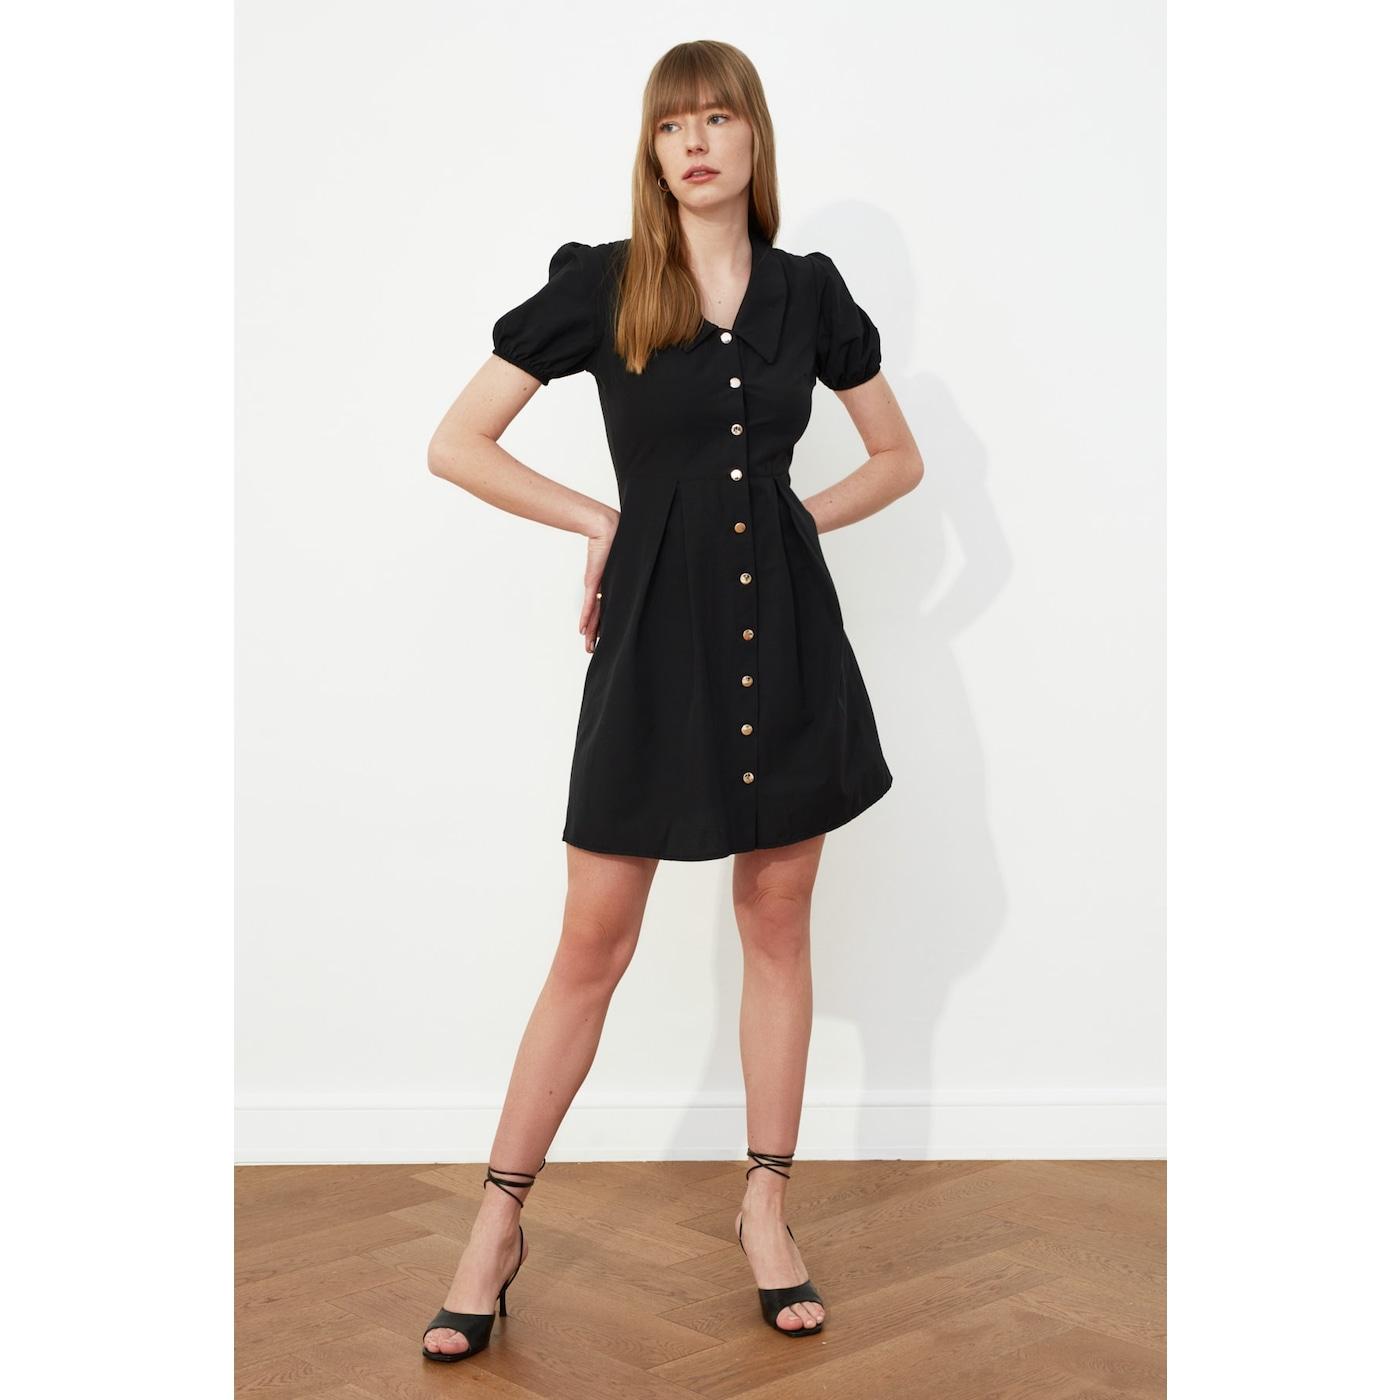 Trendyol Black Collar Detailed Buttoned Dress dámské 36